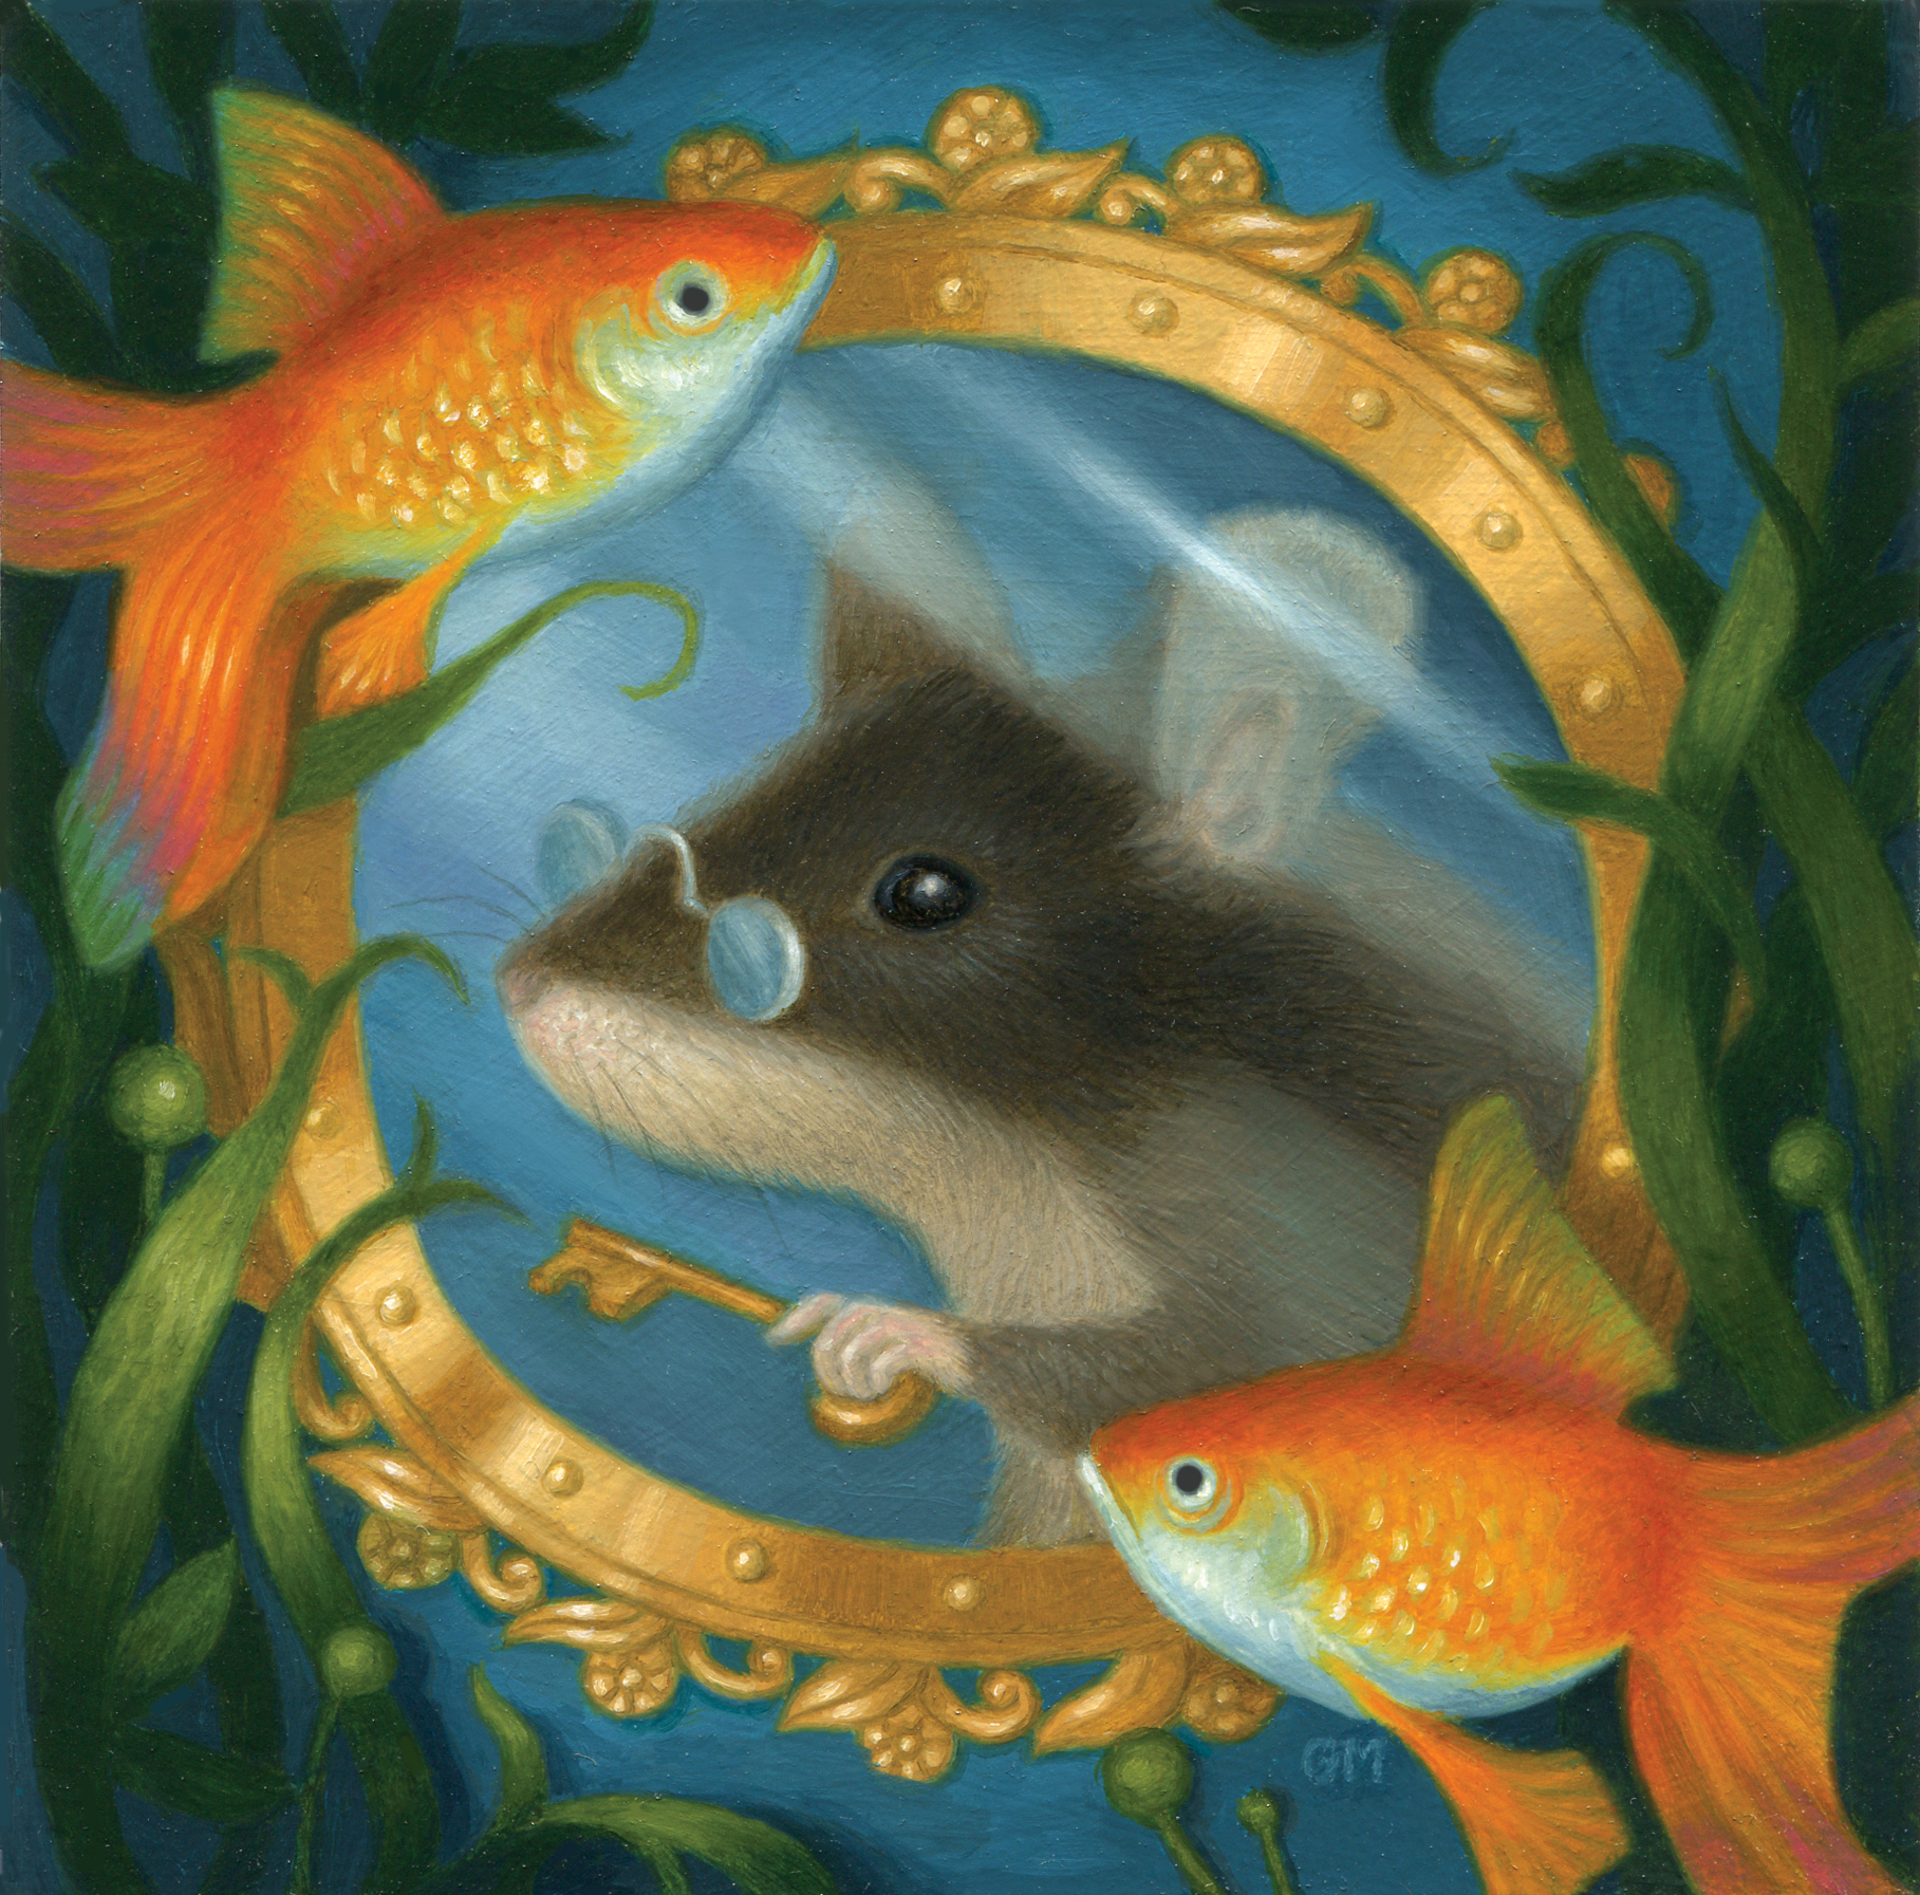 Mouse Explorer Extraordinaire by Gina Matarazzo